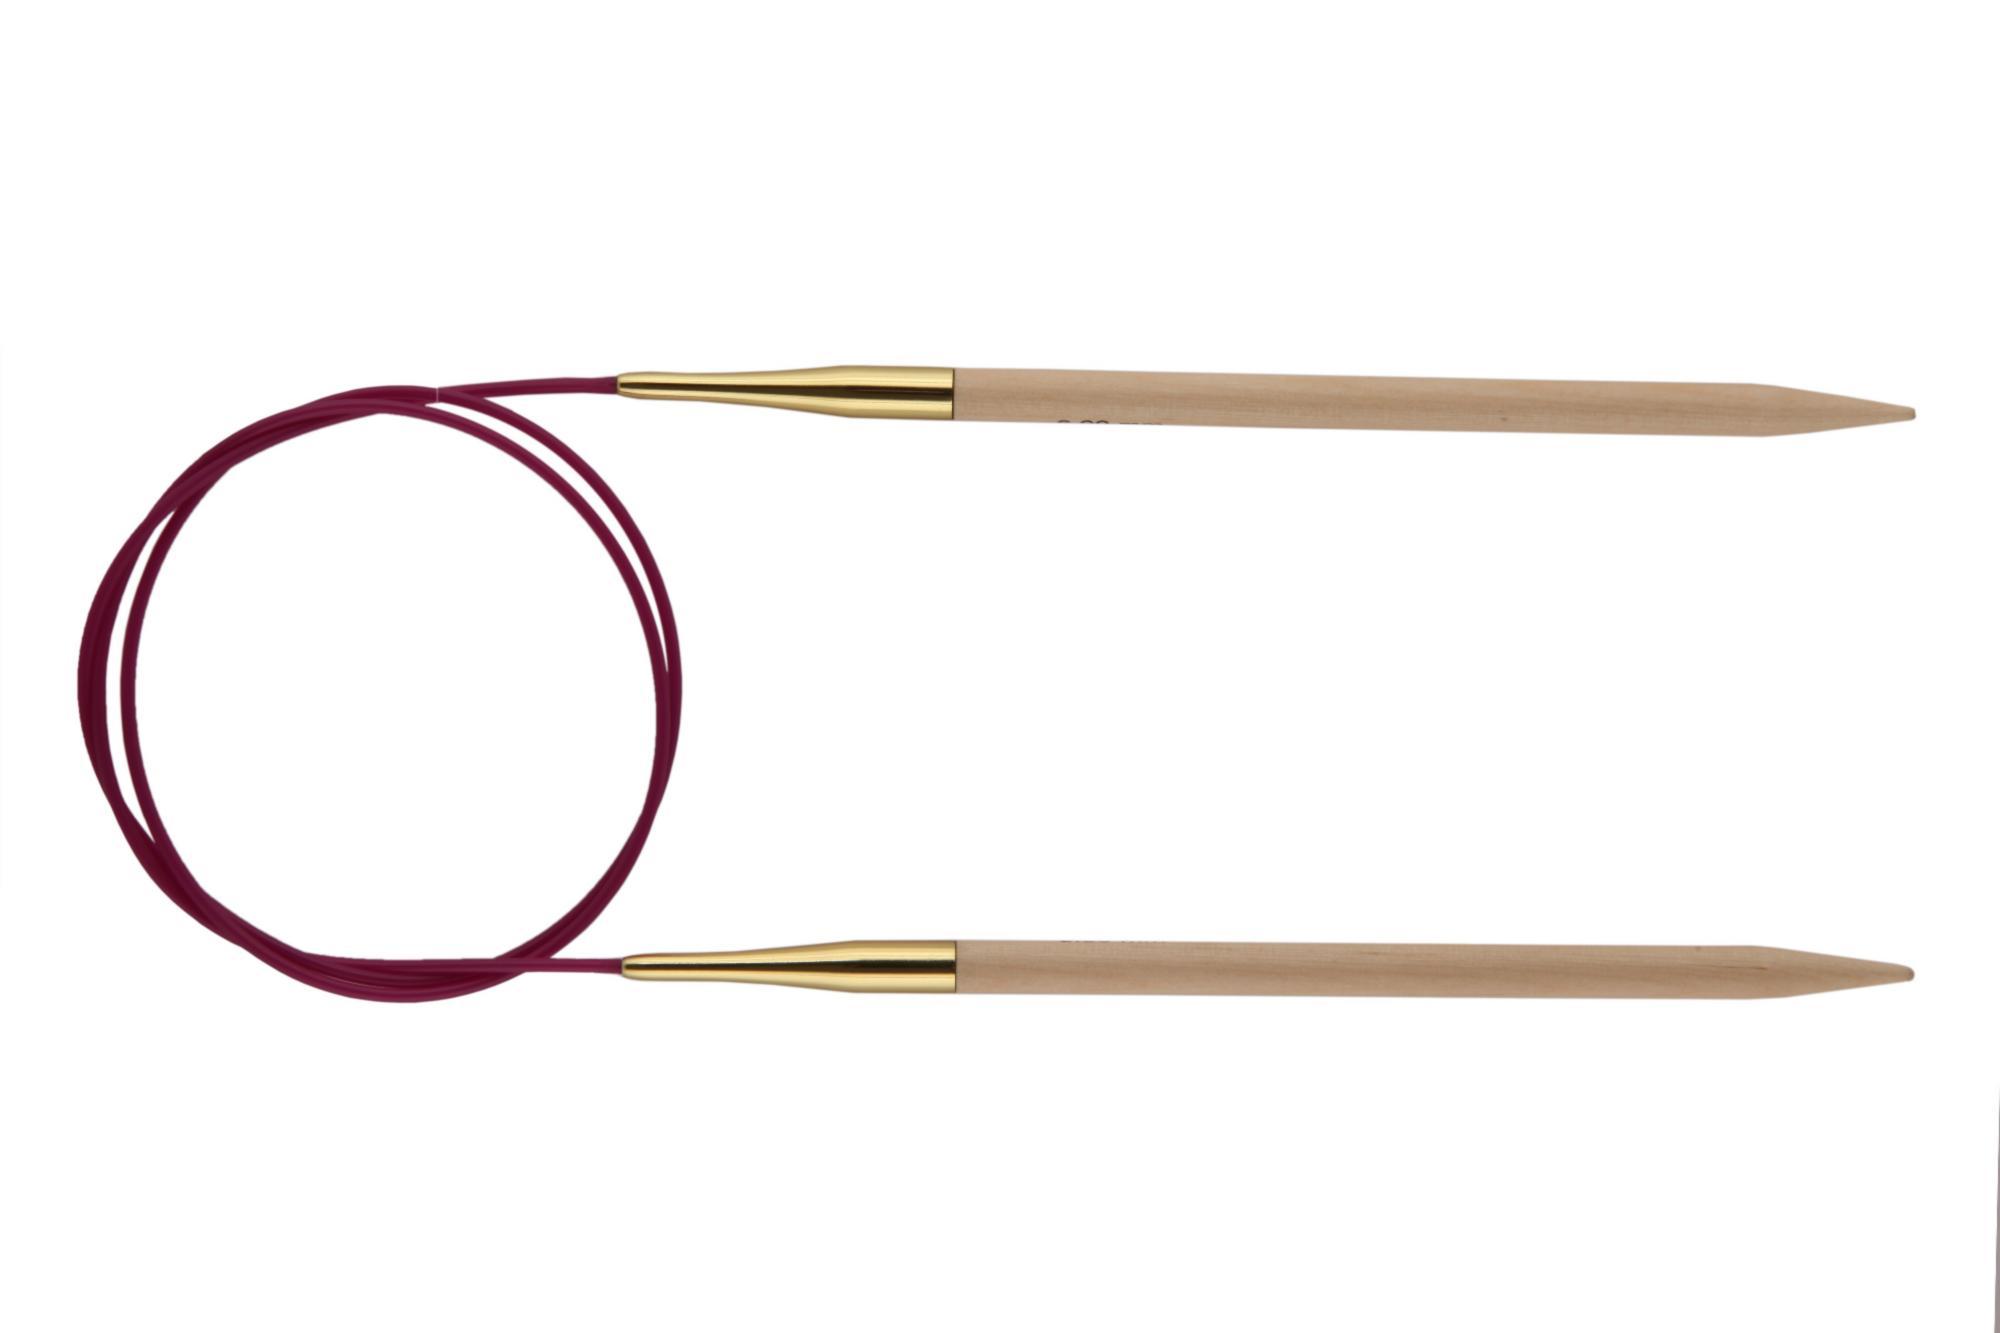 Спицы круговые 100 см Basix Birch Wood KnitPro, 35396, 5.00 мм